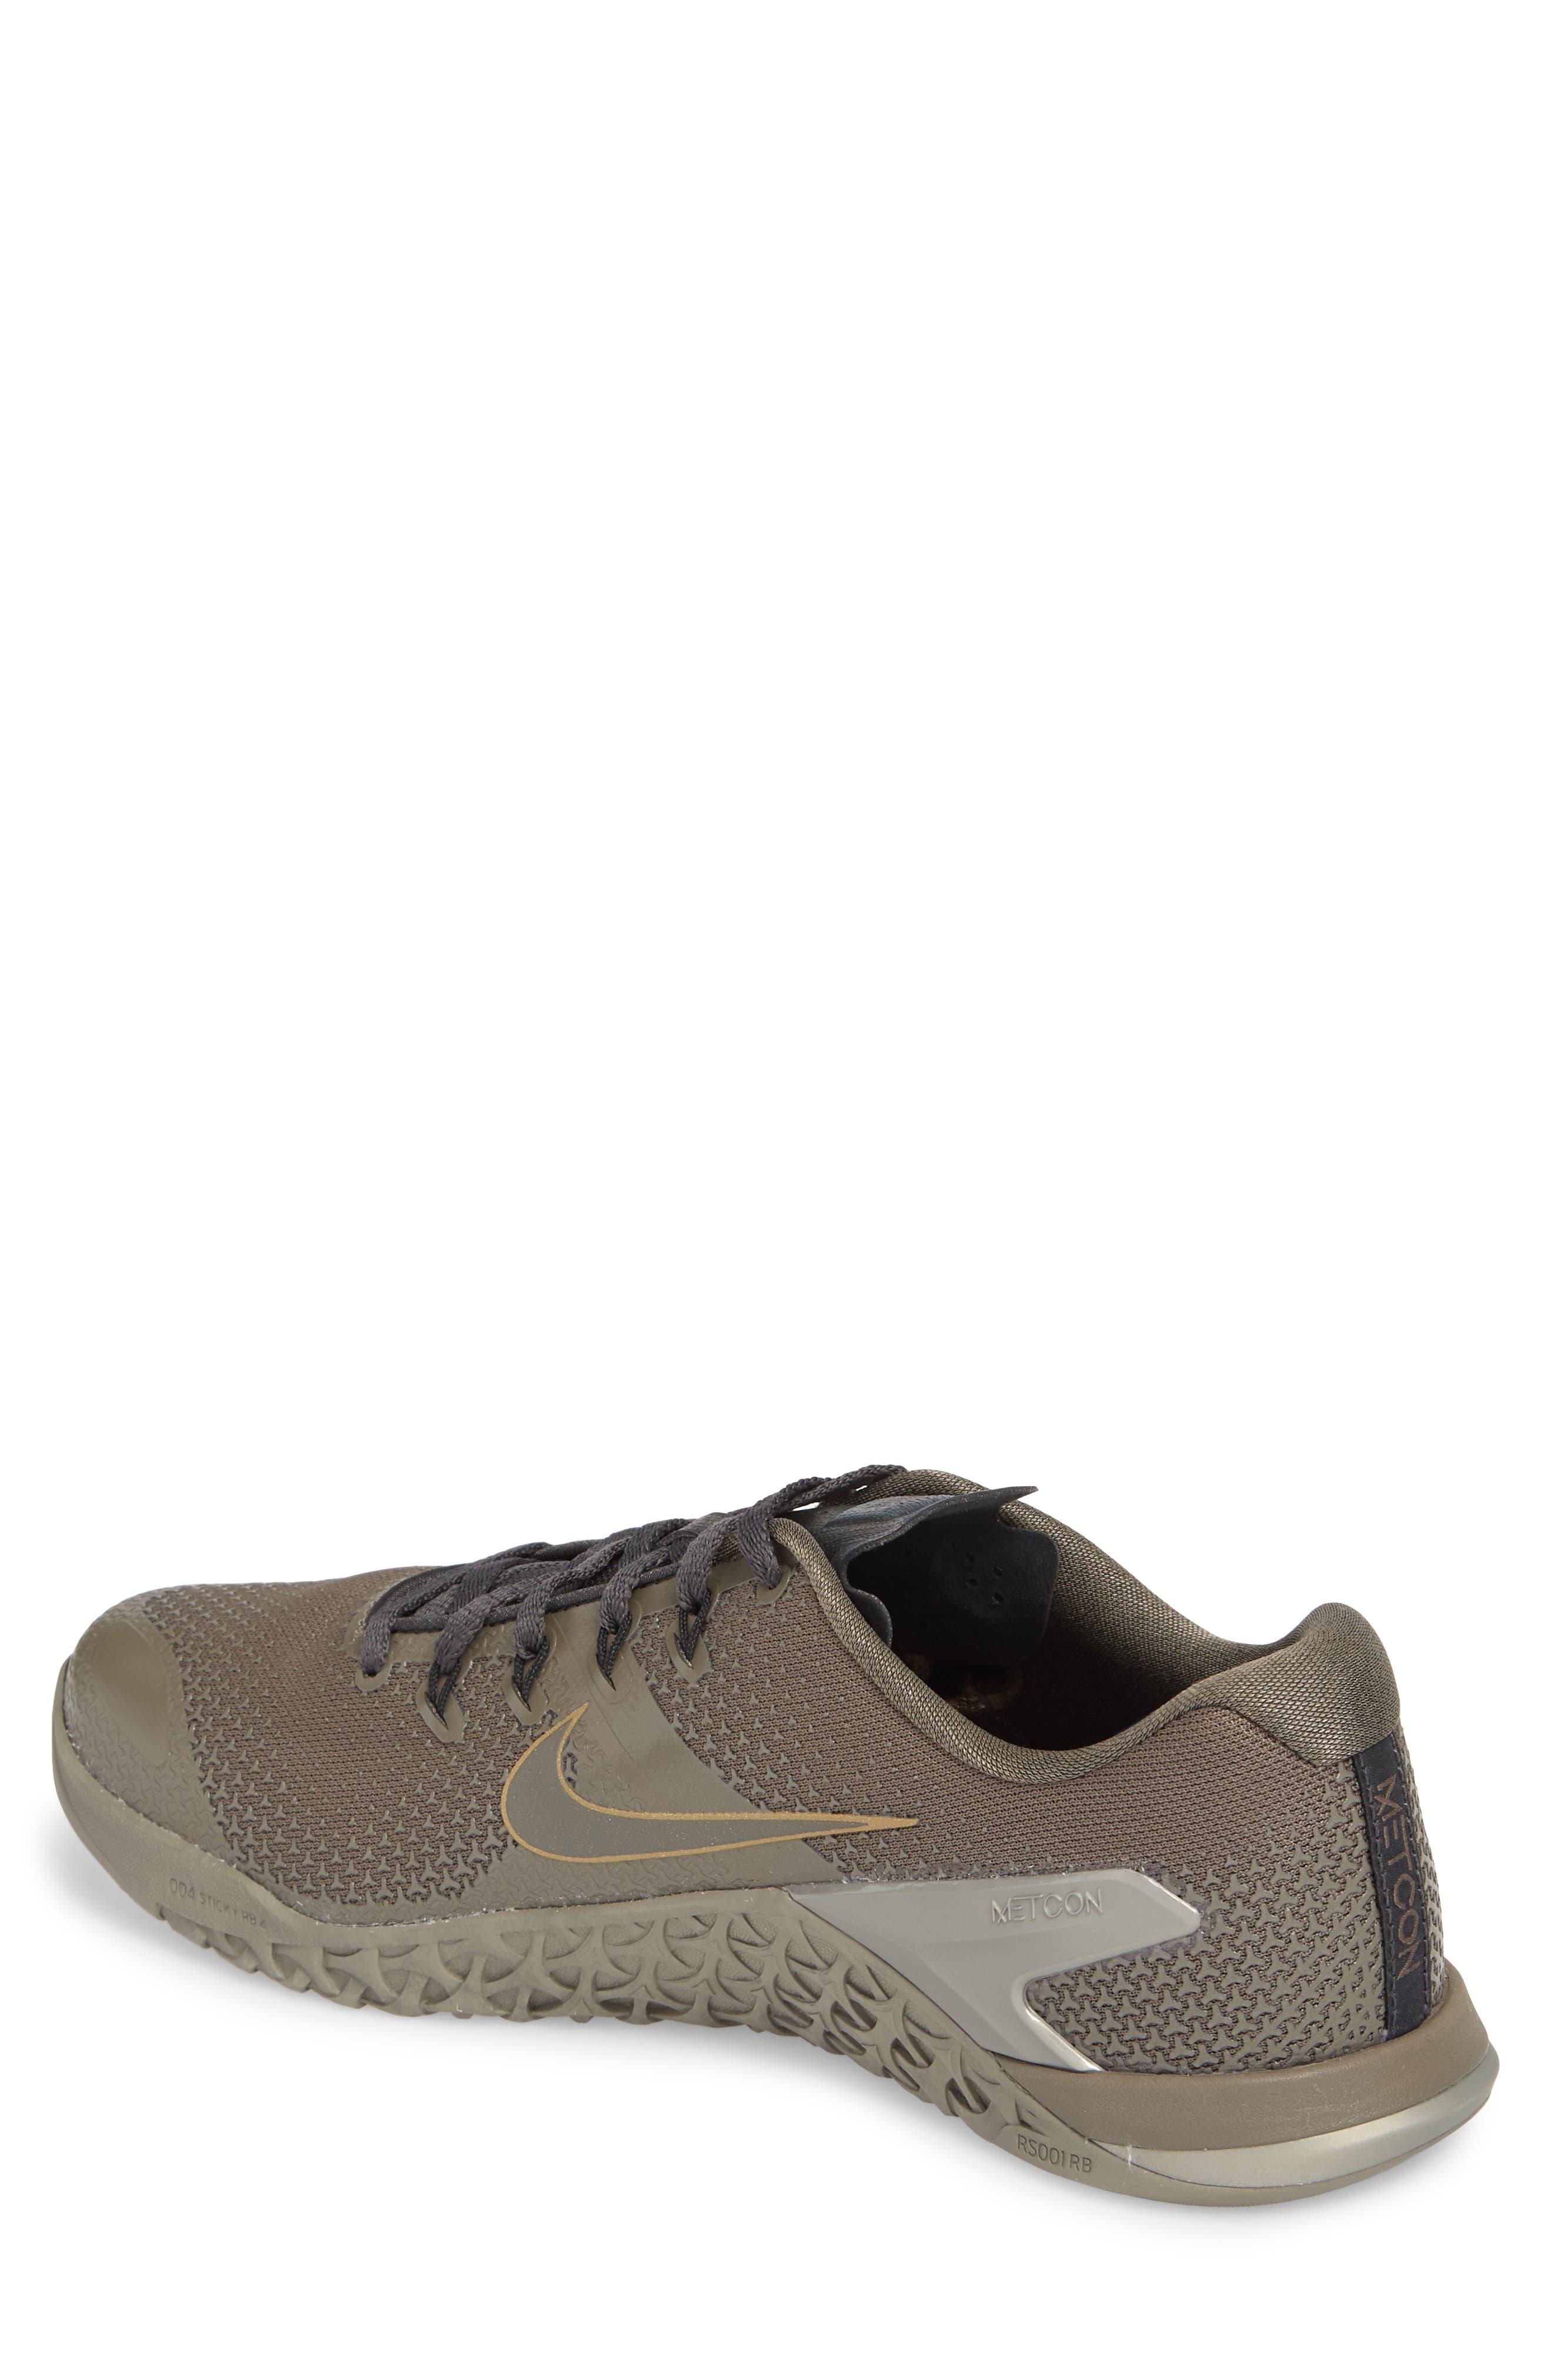 Metcon 4 Viking Quest Training Shoe,                             Alternate thumbnail 2, color,                             Ridgerock/ Pewter/ Anthracite